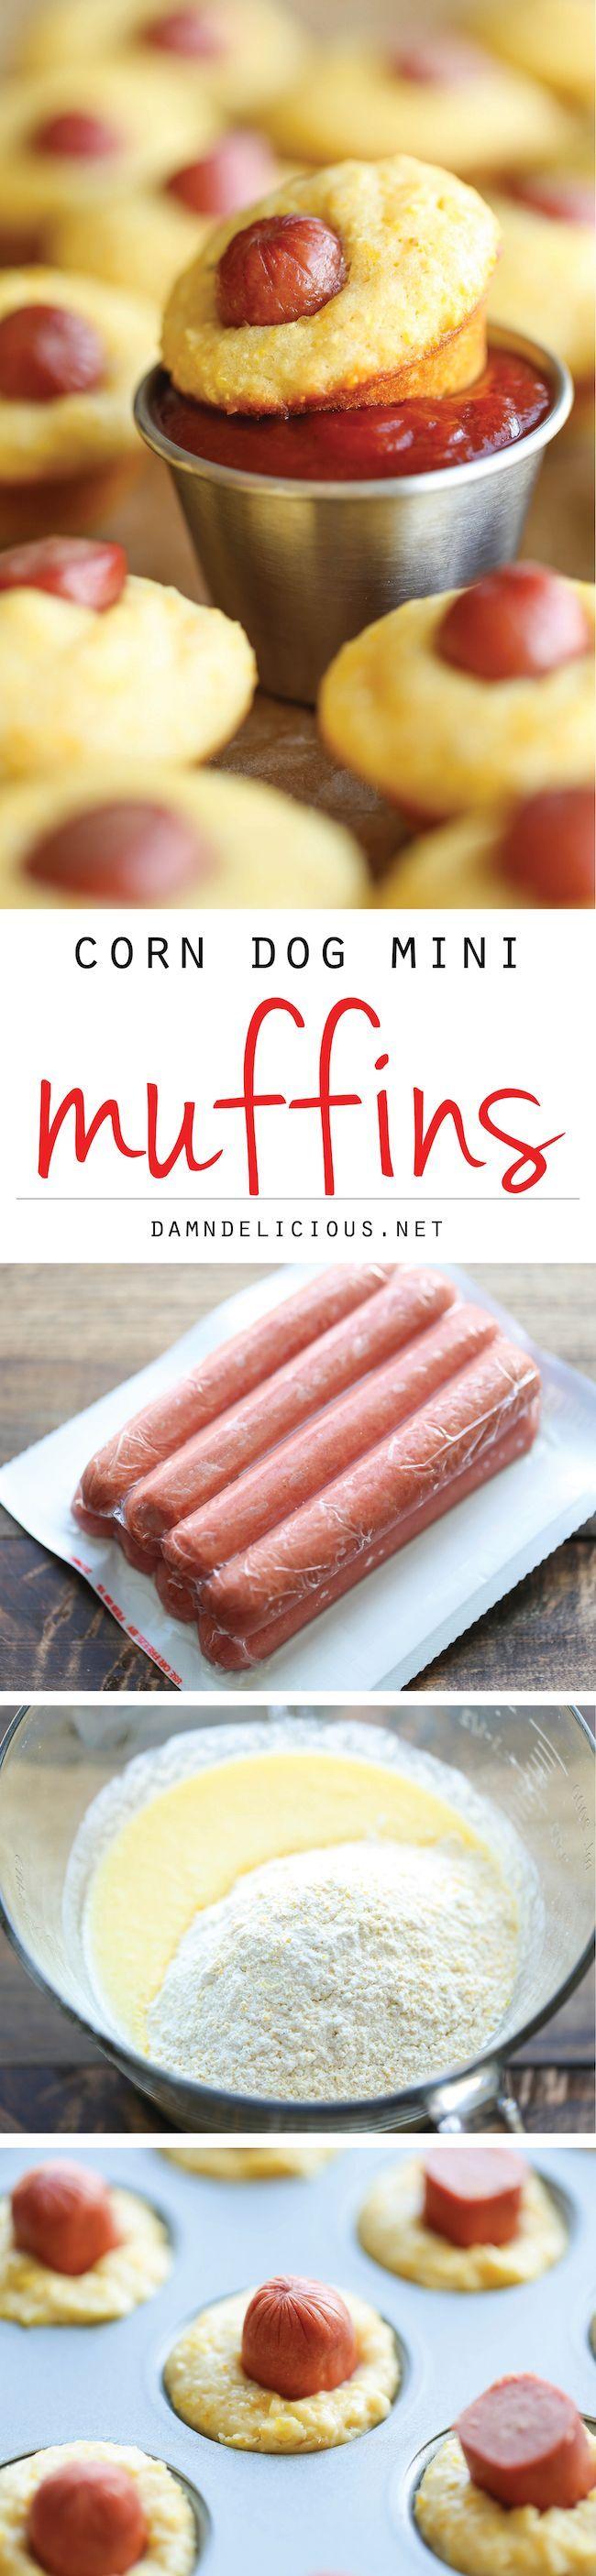 Corn Dog Mini Muffins! YUM. (Via @DamnDelicious)